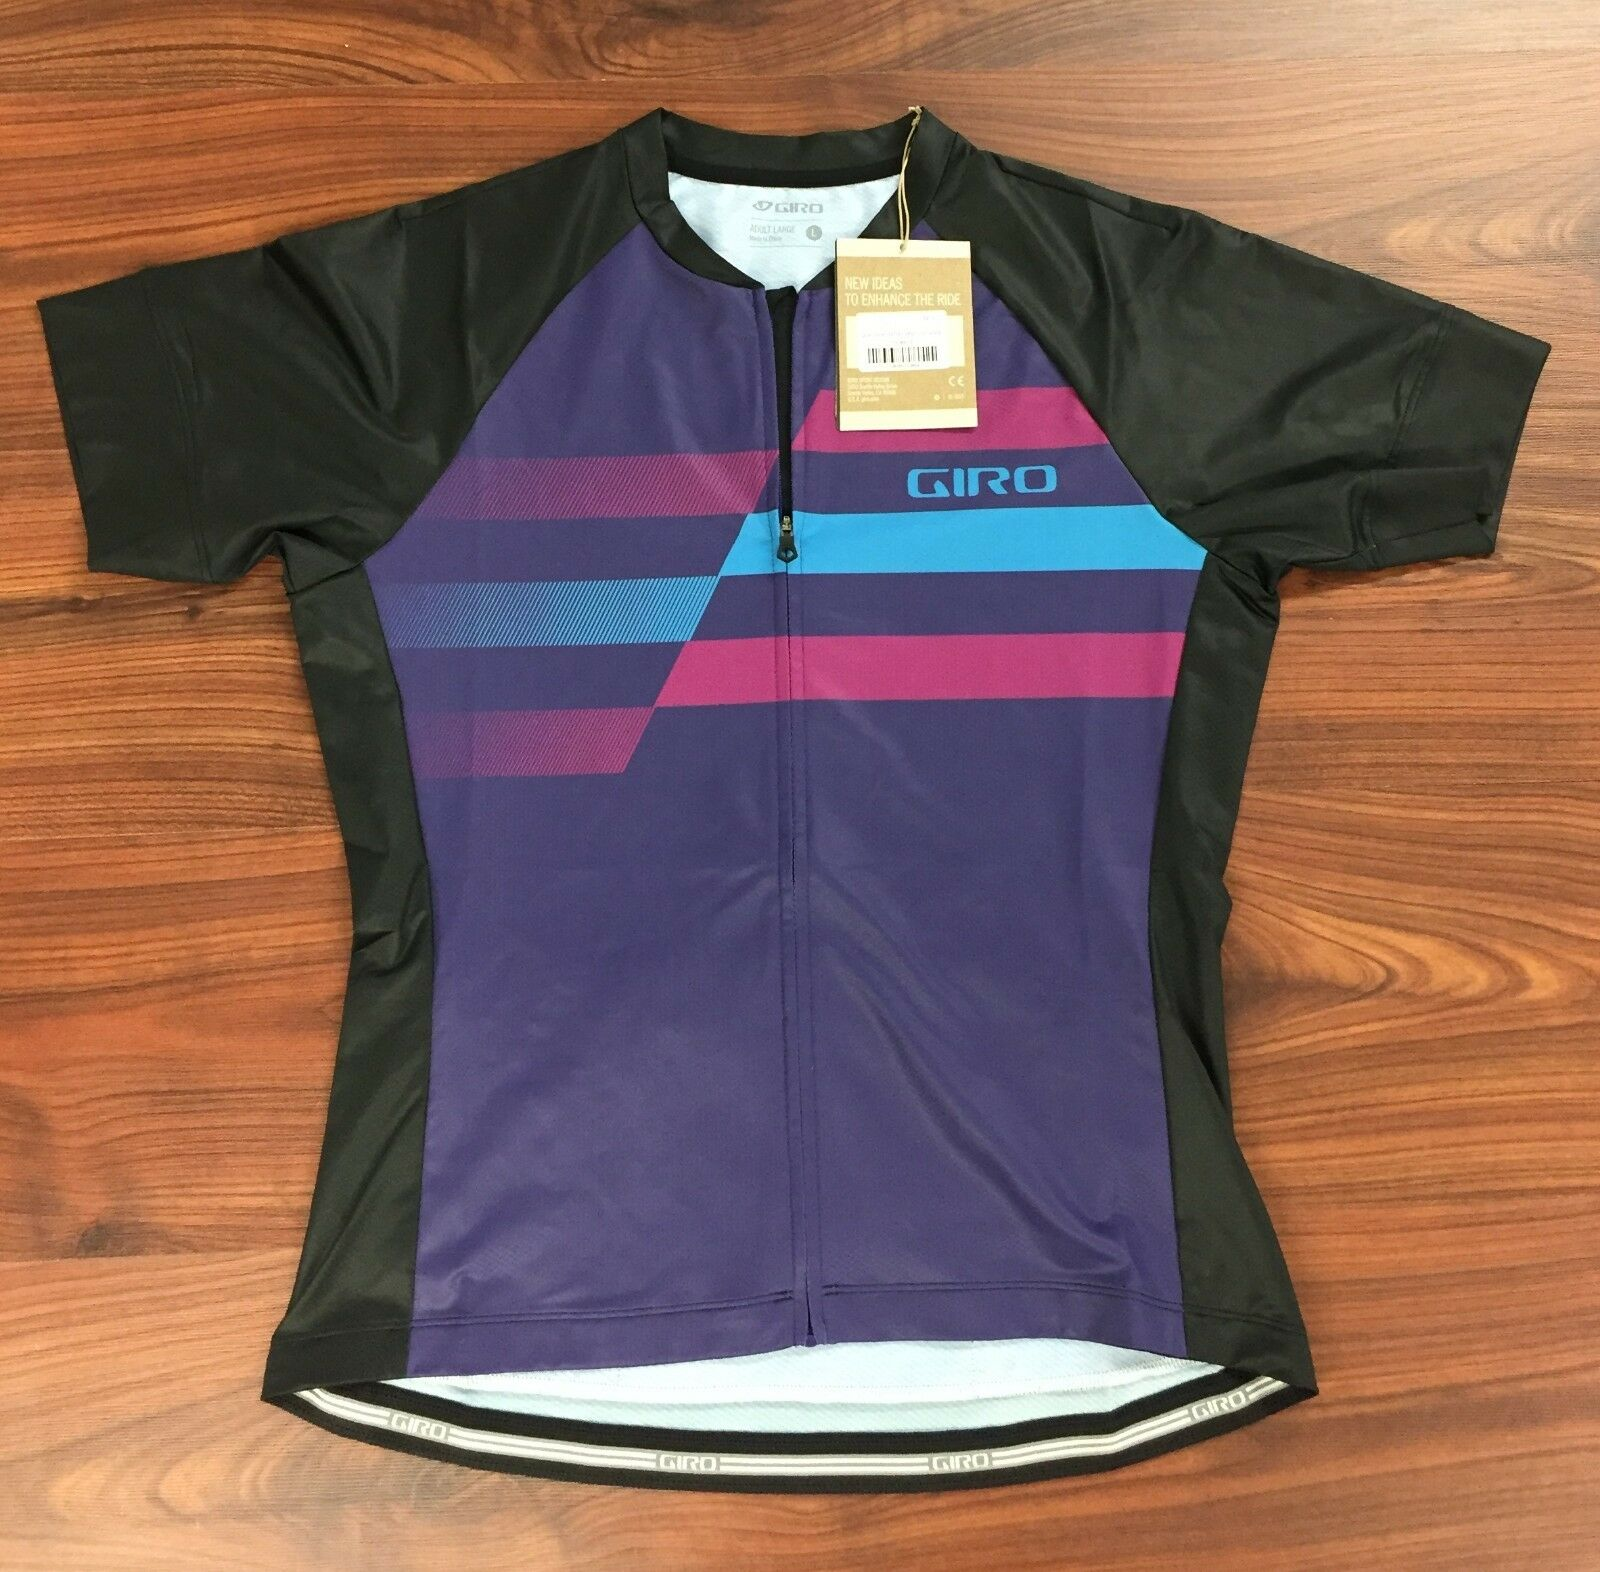 Giro Women's Chrono Cycling Jersey Size Large New